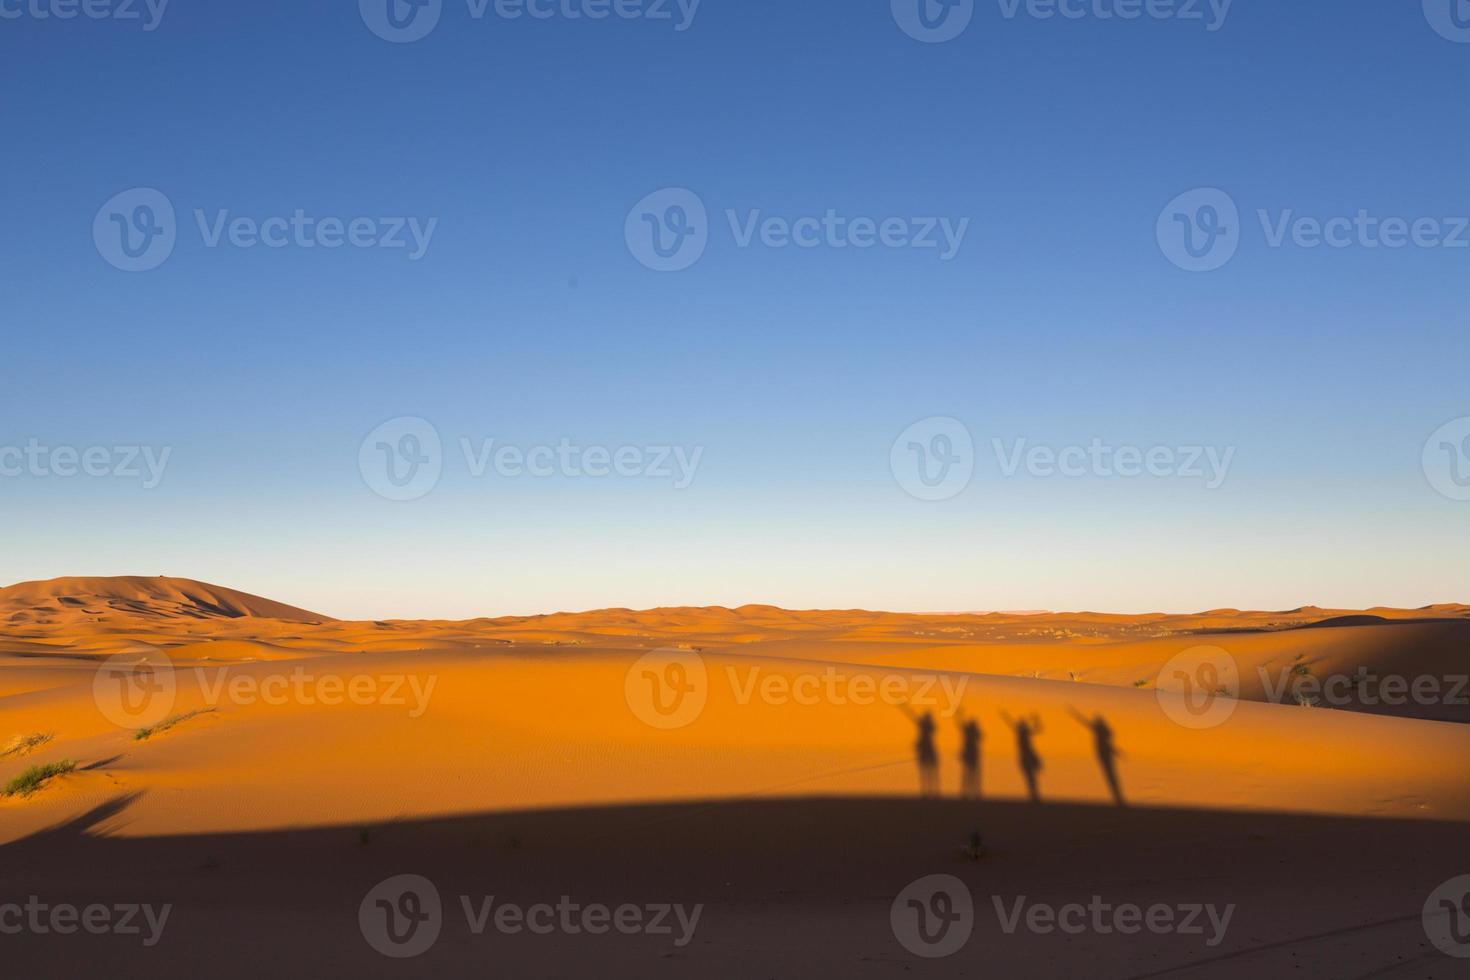 schaduwen van gelukkige mensen op duinen, woestijn Sahara Marokko, Afrika foto